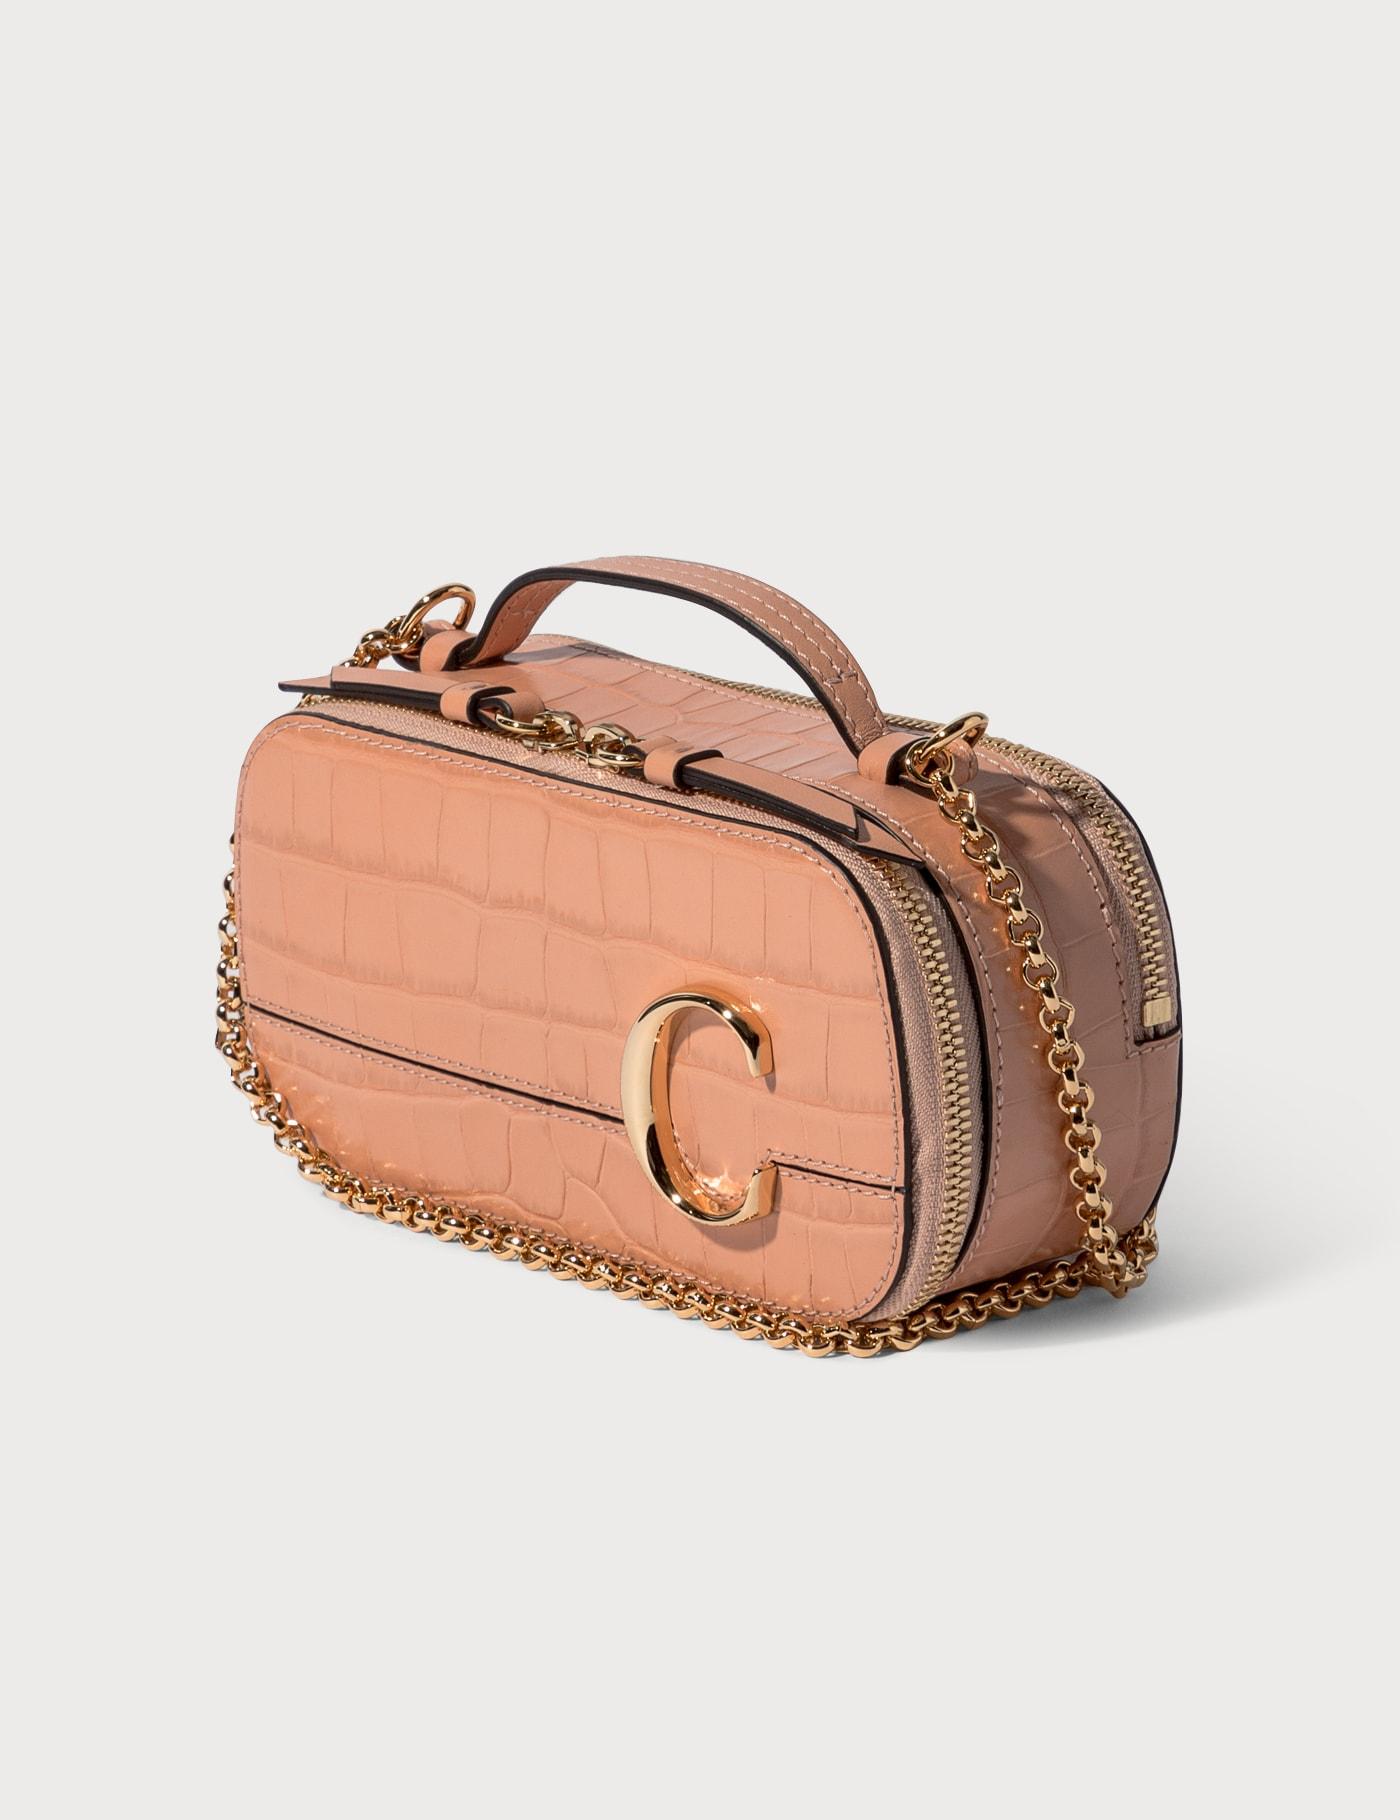 Chlou00e9 C Mini Vanity Bag